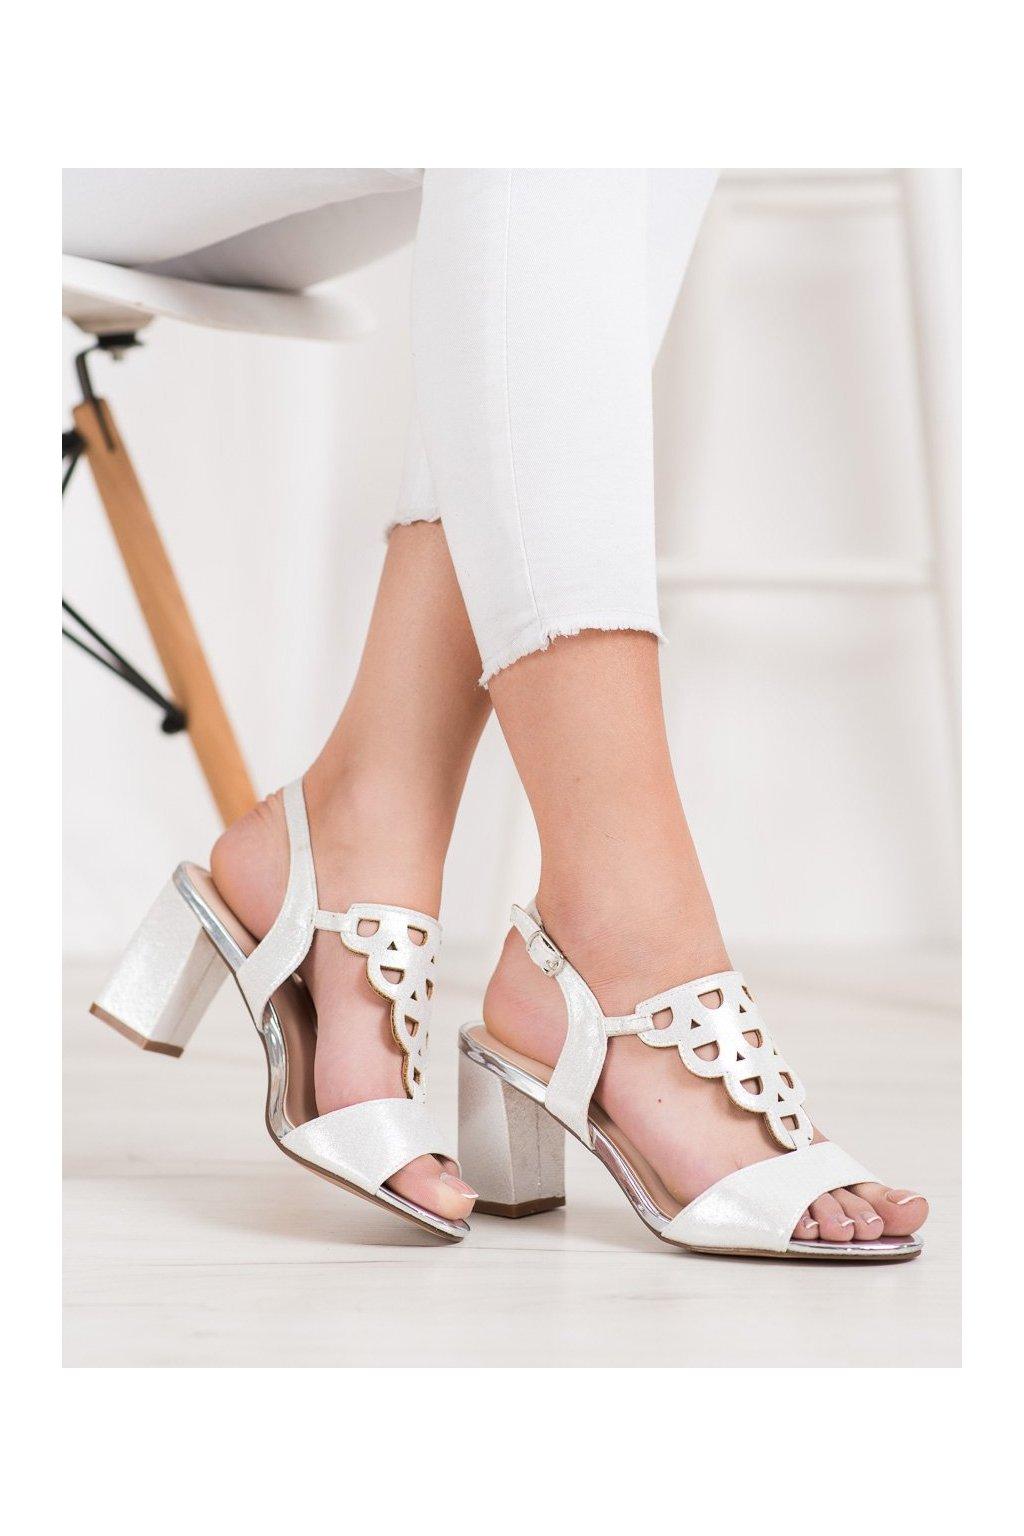 Sivé topánky Vinceza kod YQE20-17080S